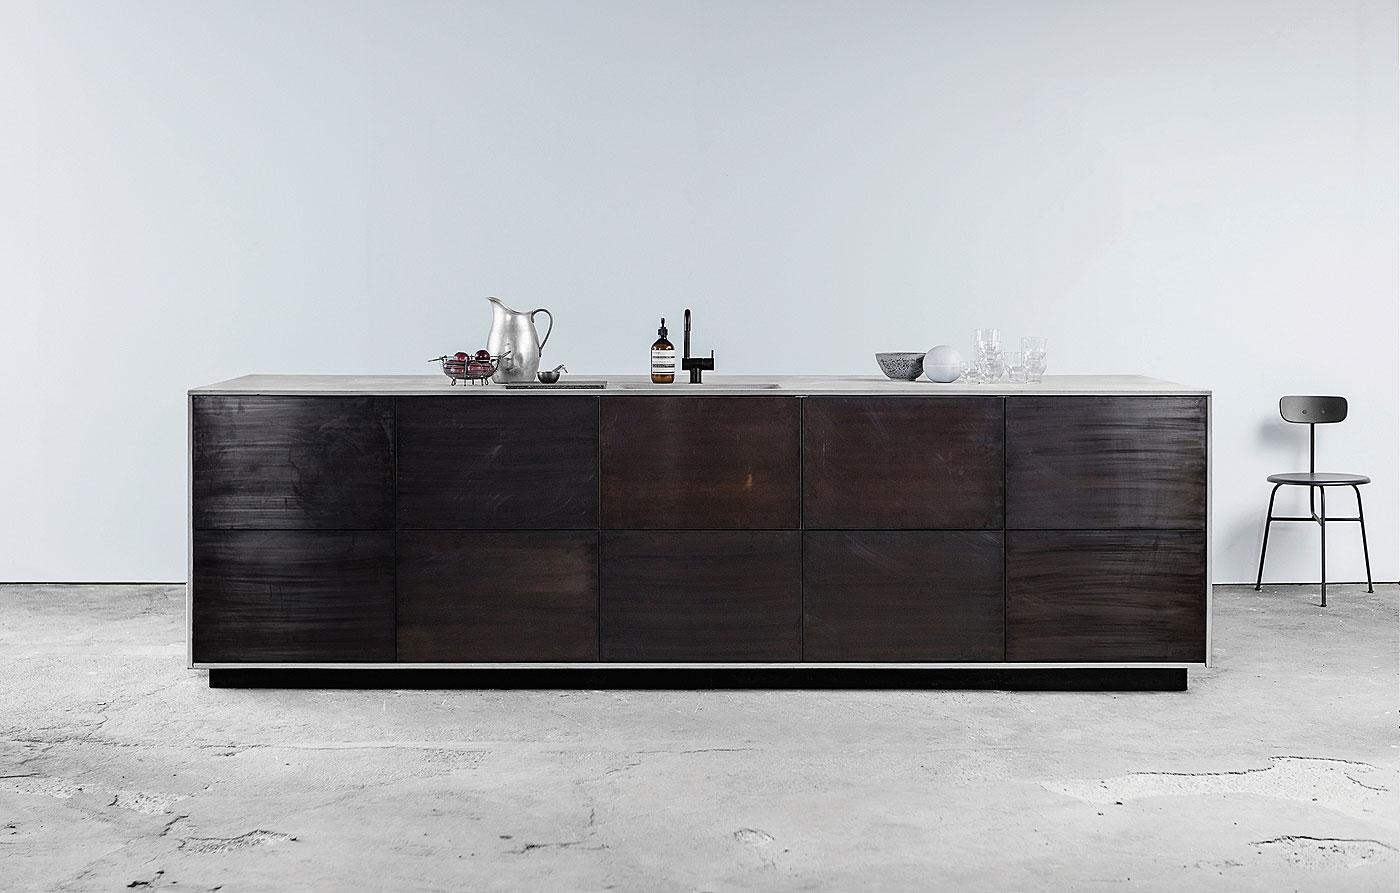 cocina-reform-norm-architects (1)